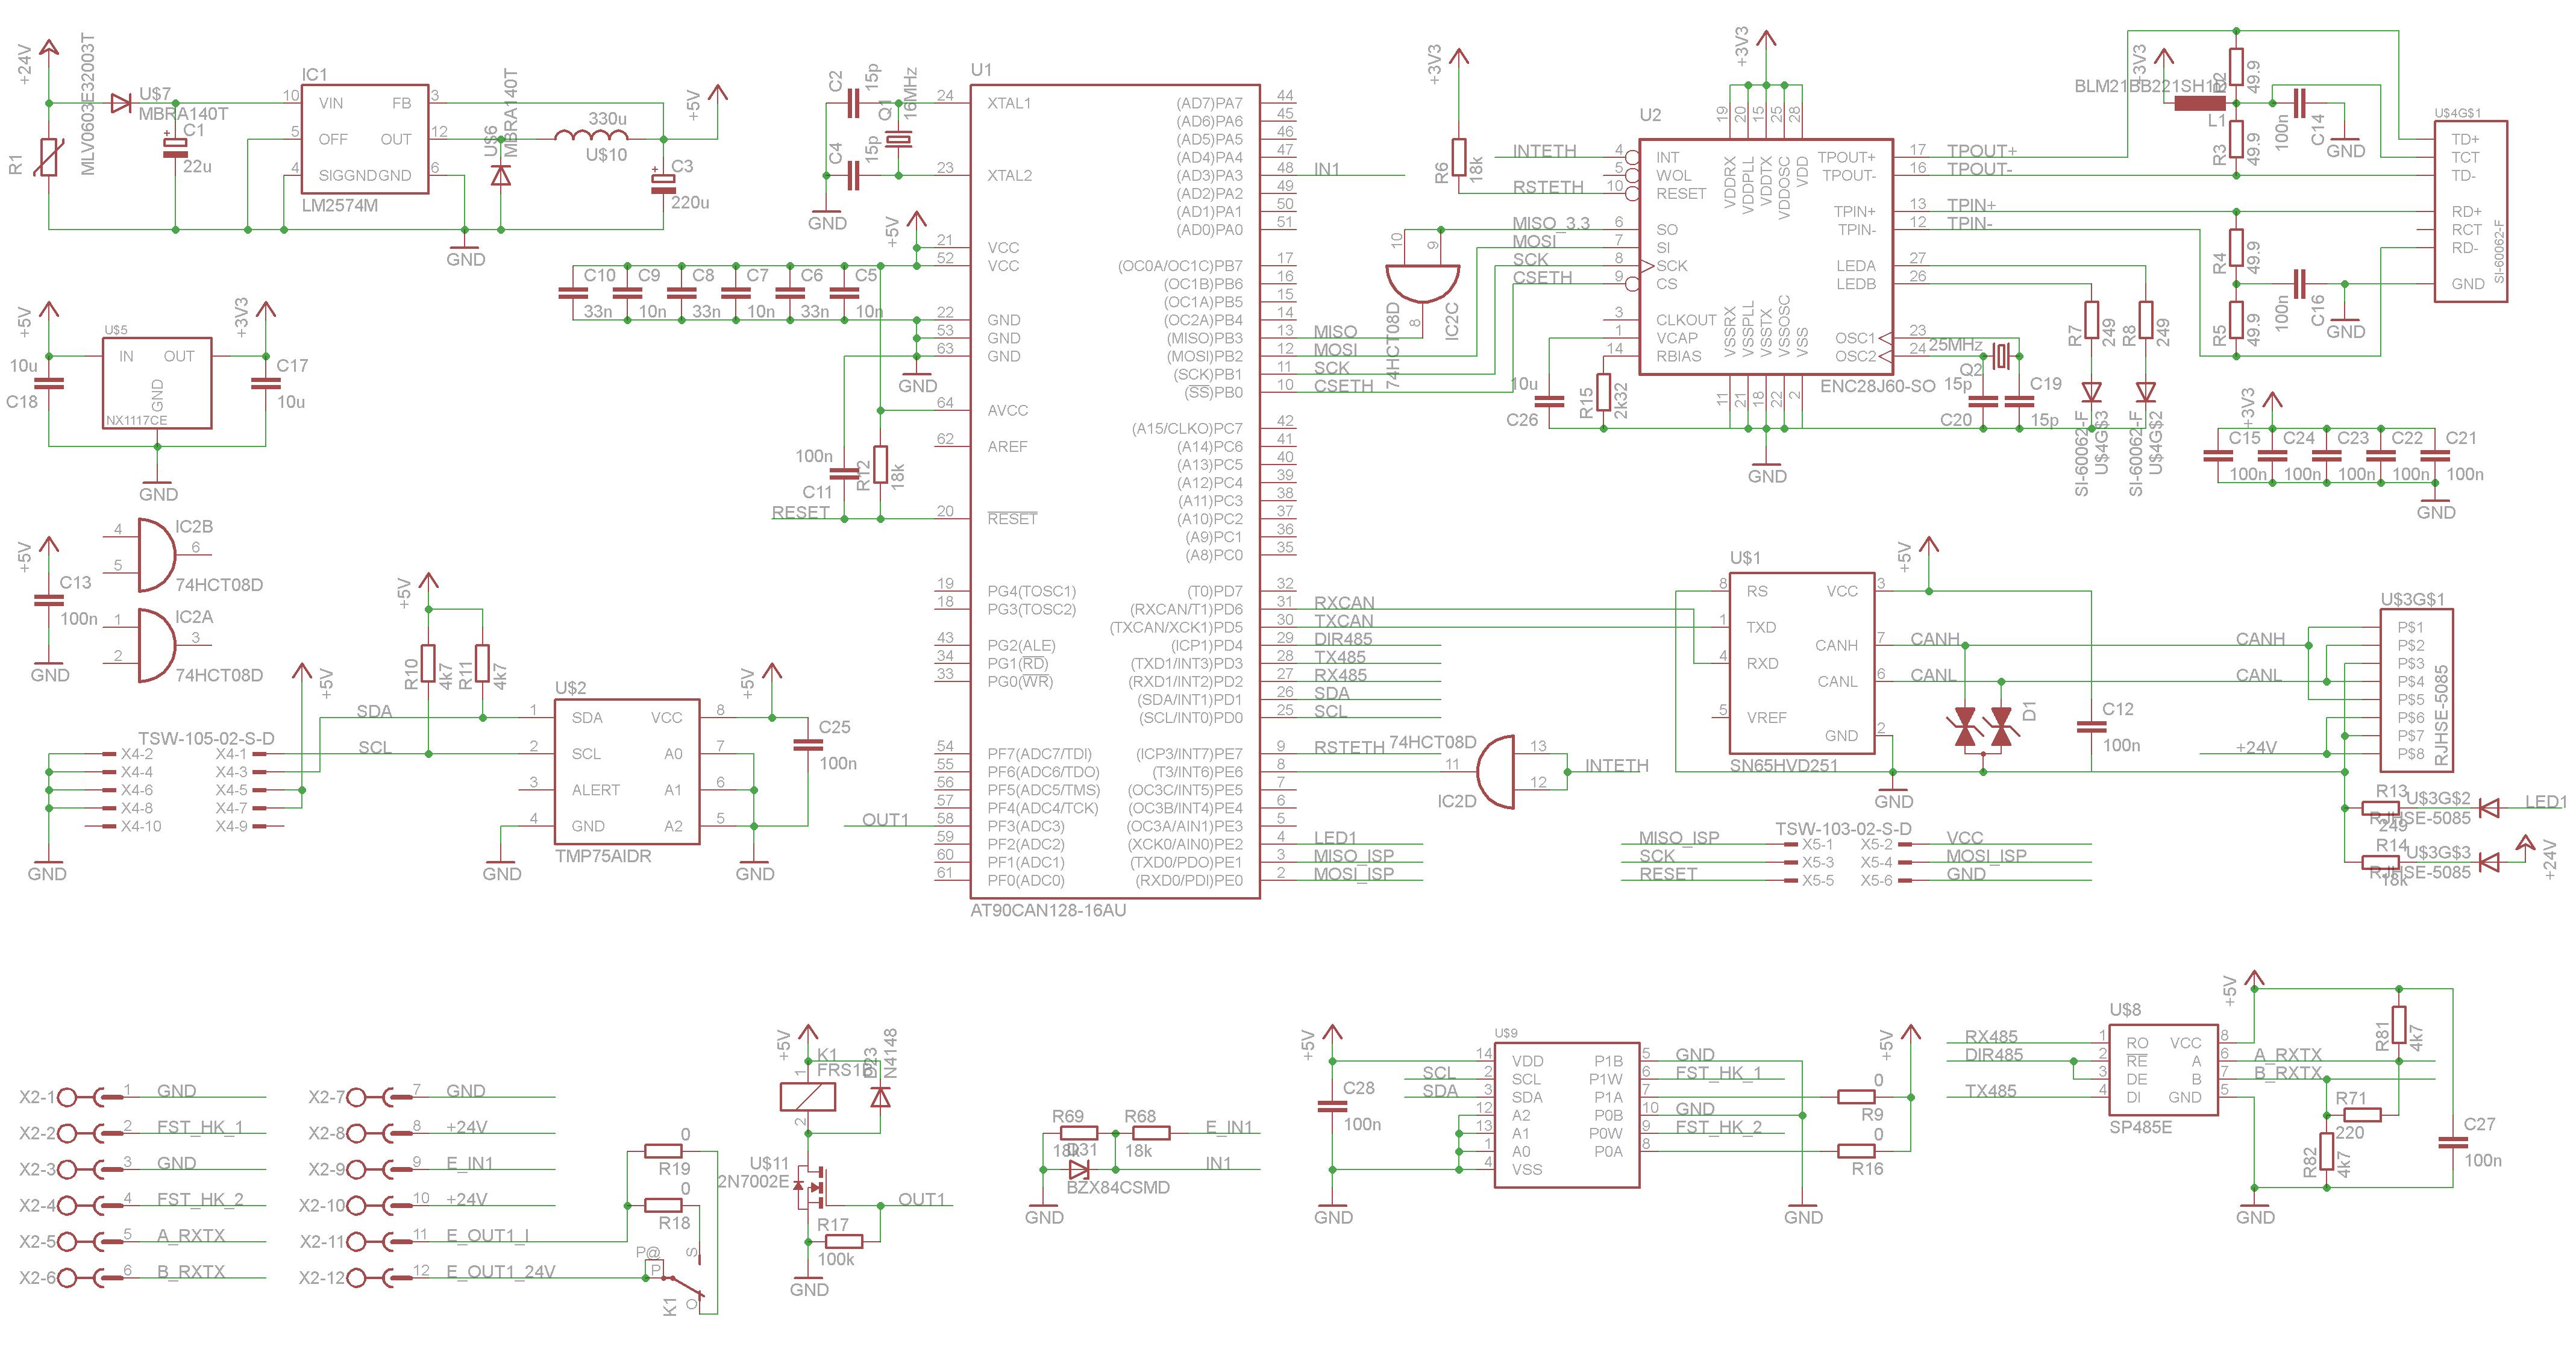 KWB Kessel RS485 Protokoll - Mikrocontroller.net